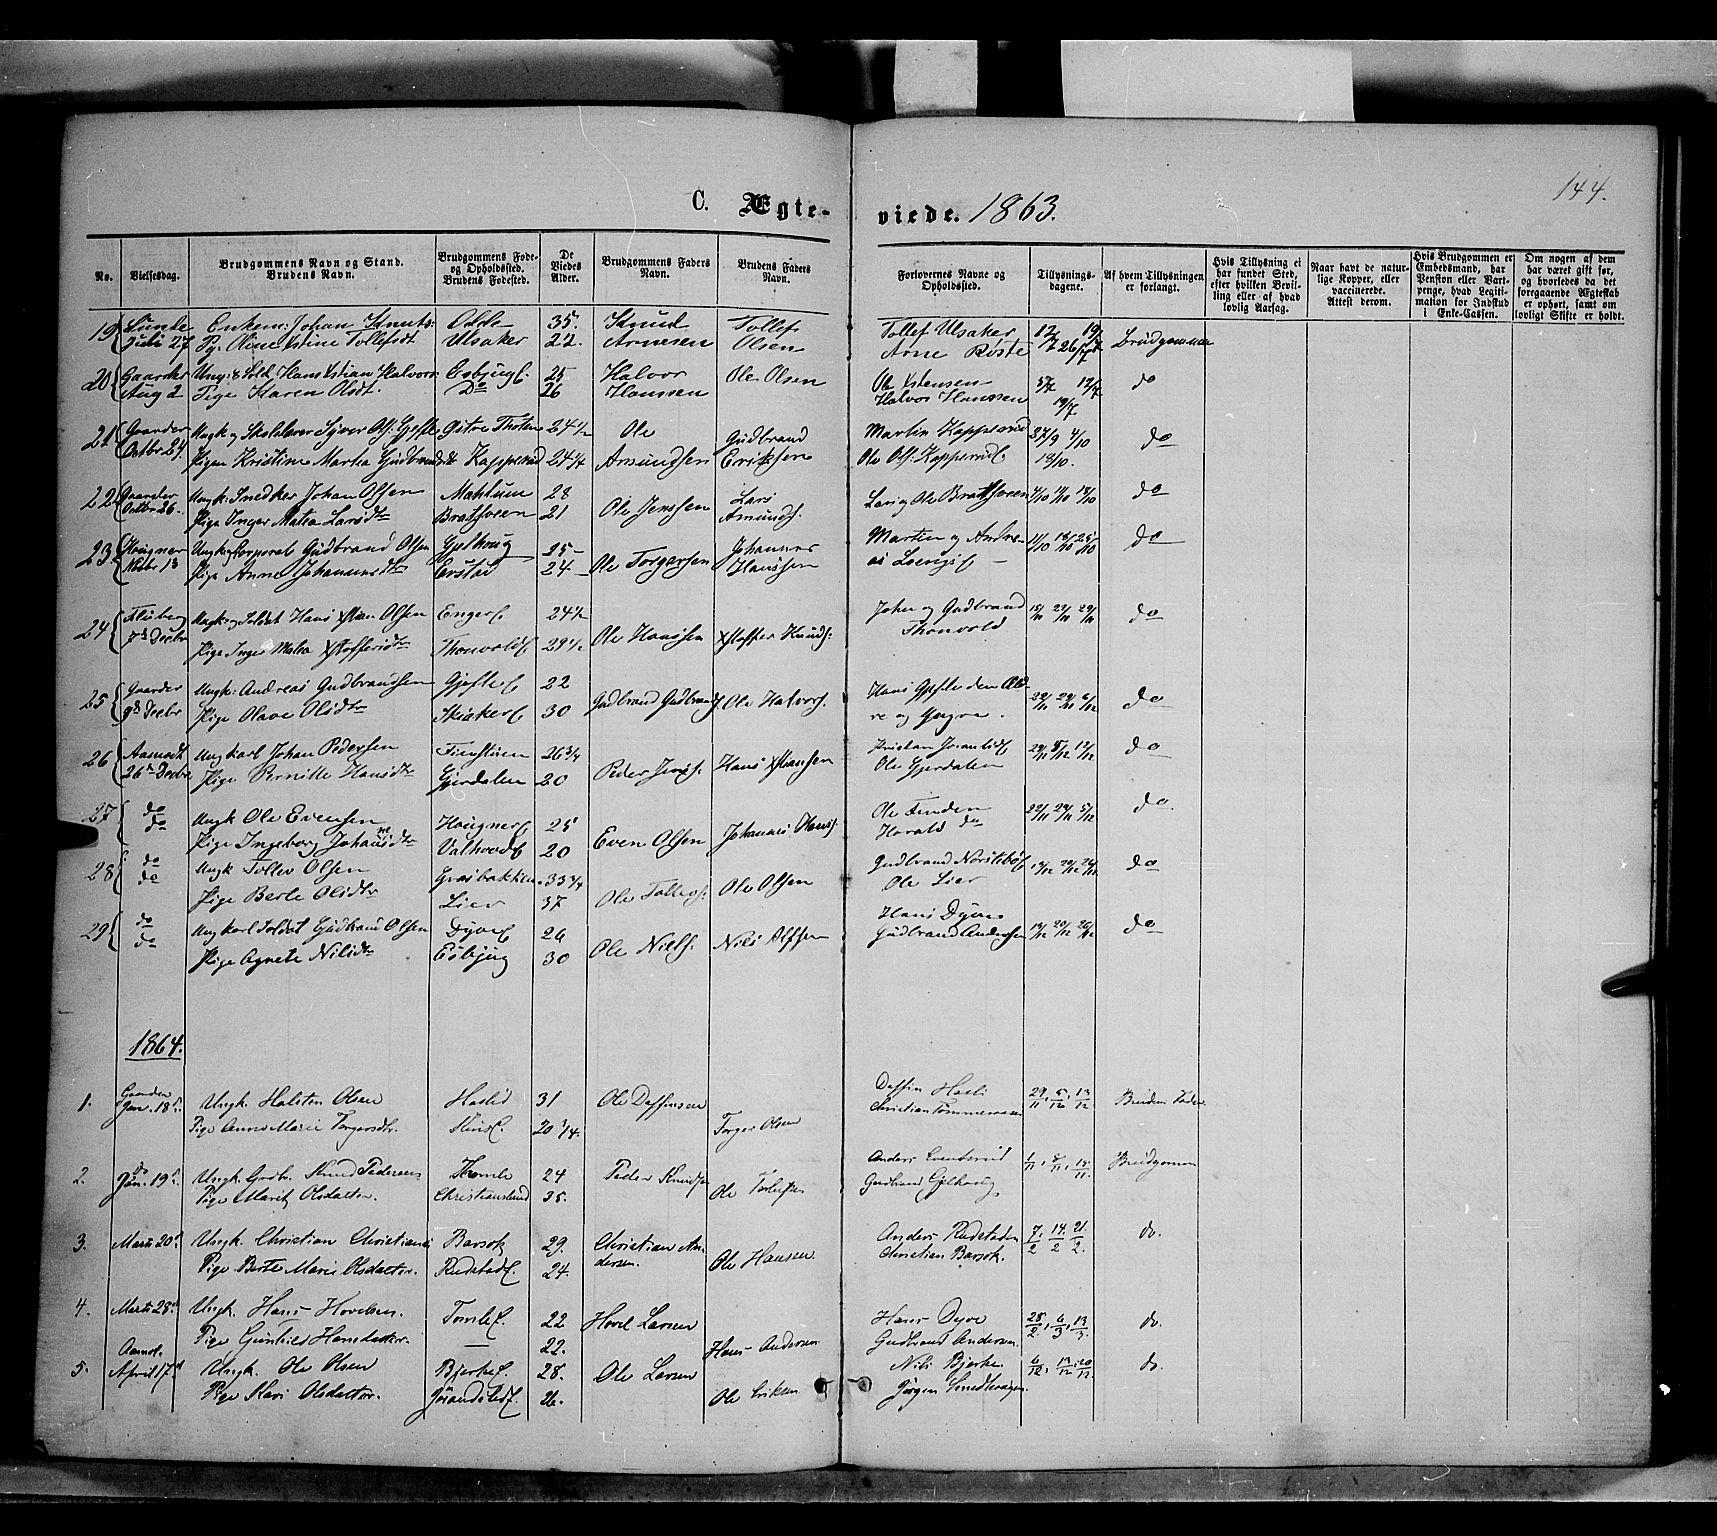 SAH, Nordre Land prestekontor, Ministerialbok nr. 1, 1860-1871, s. 144